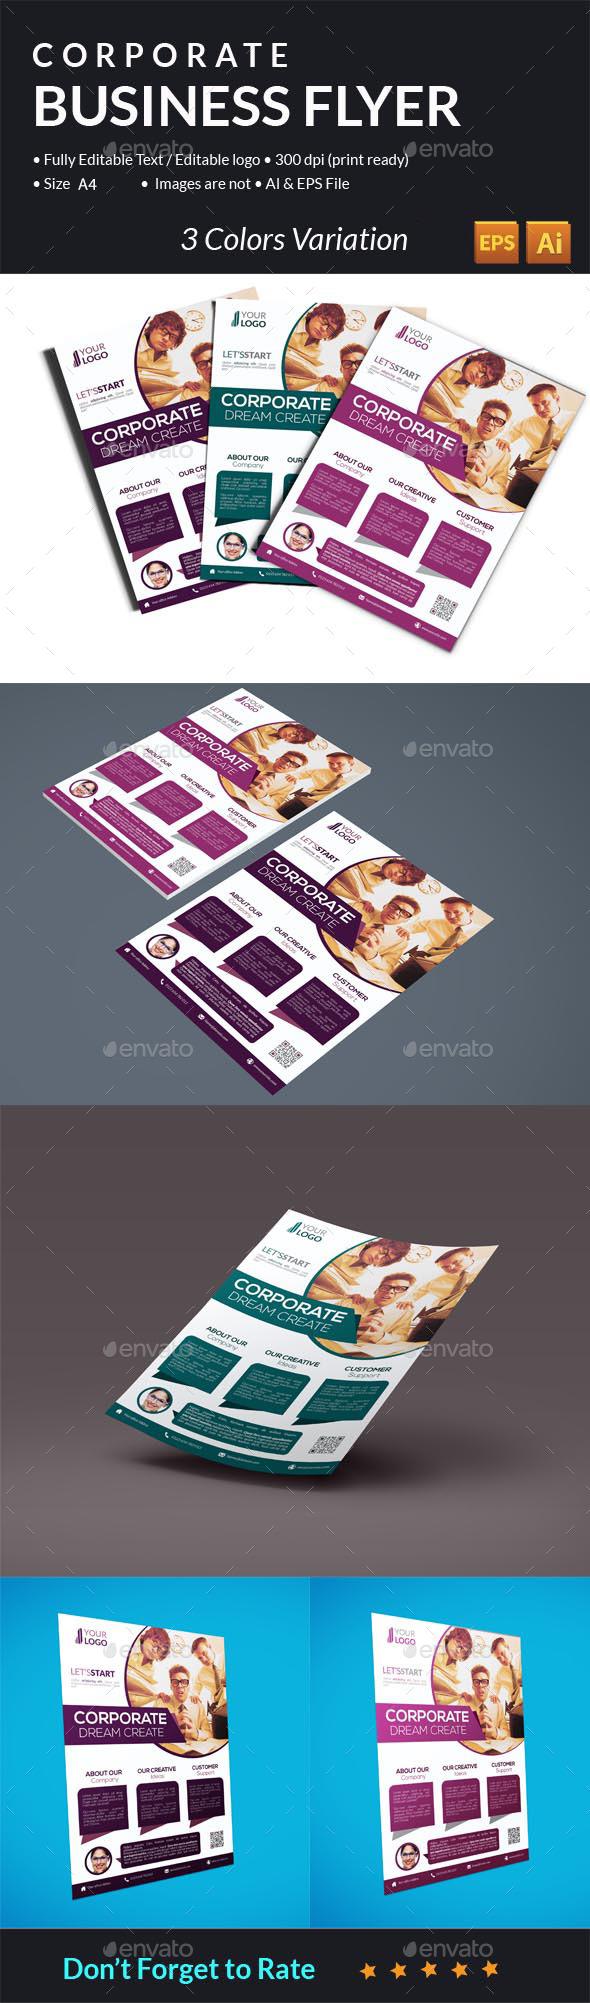 GraphicRiver Minimal Corporate Flyer 10759289